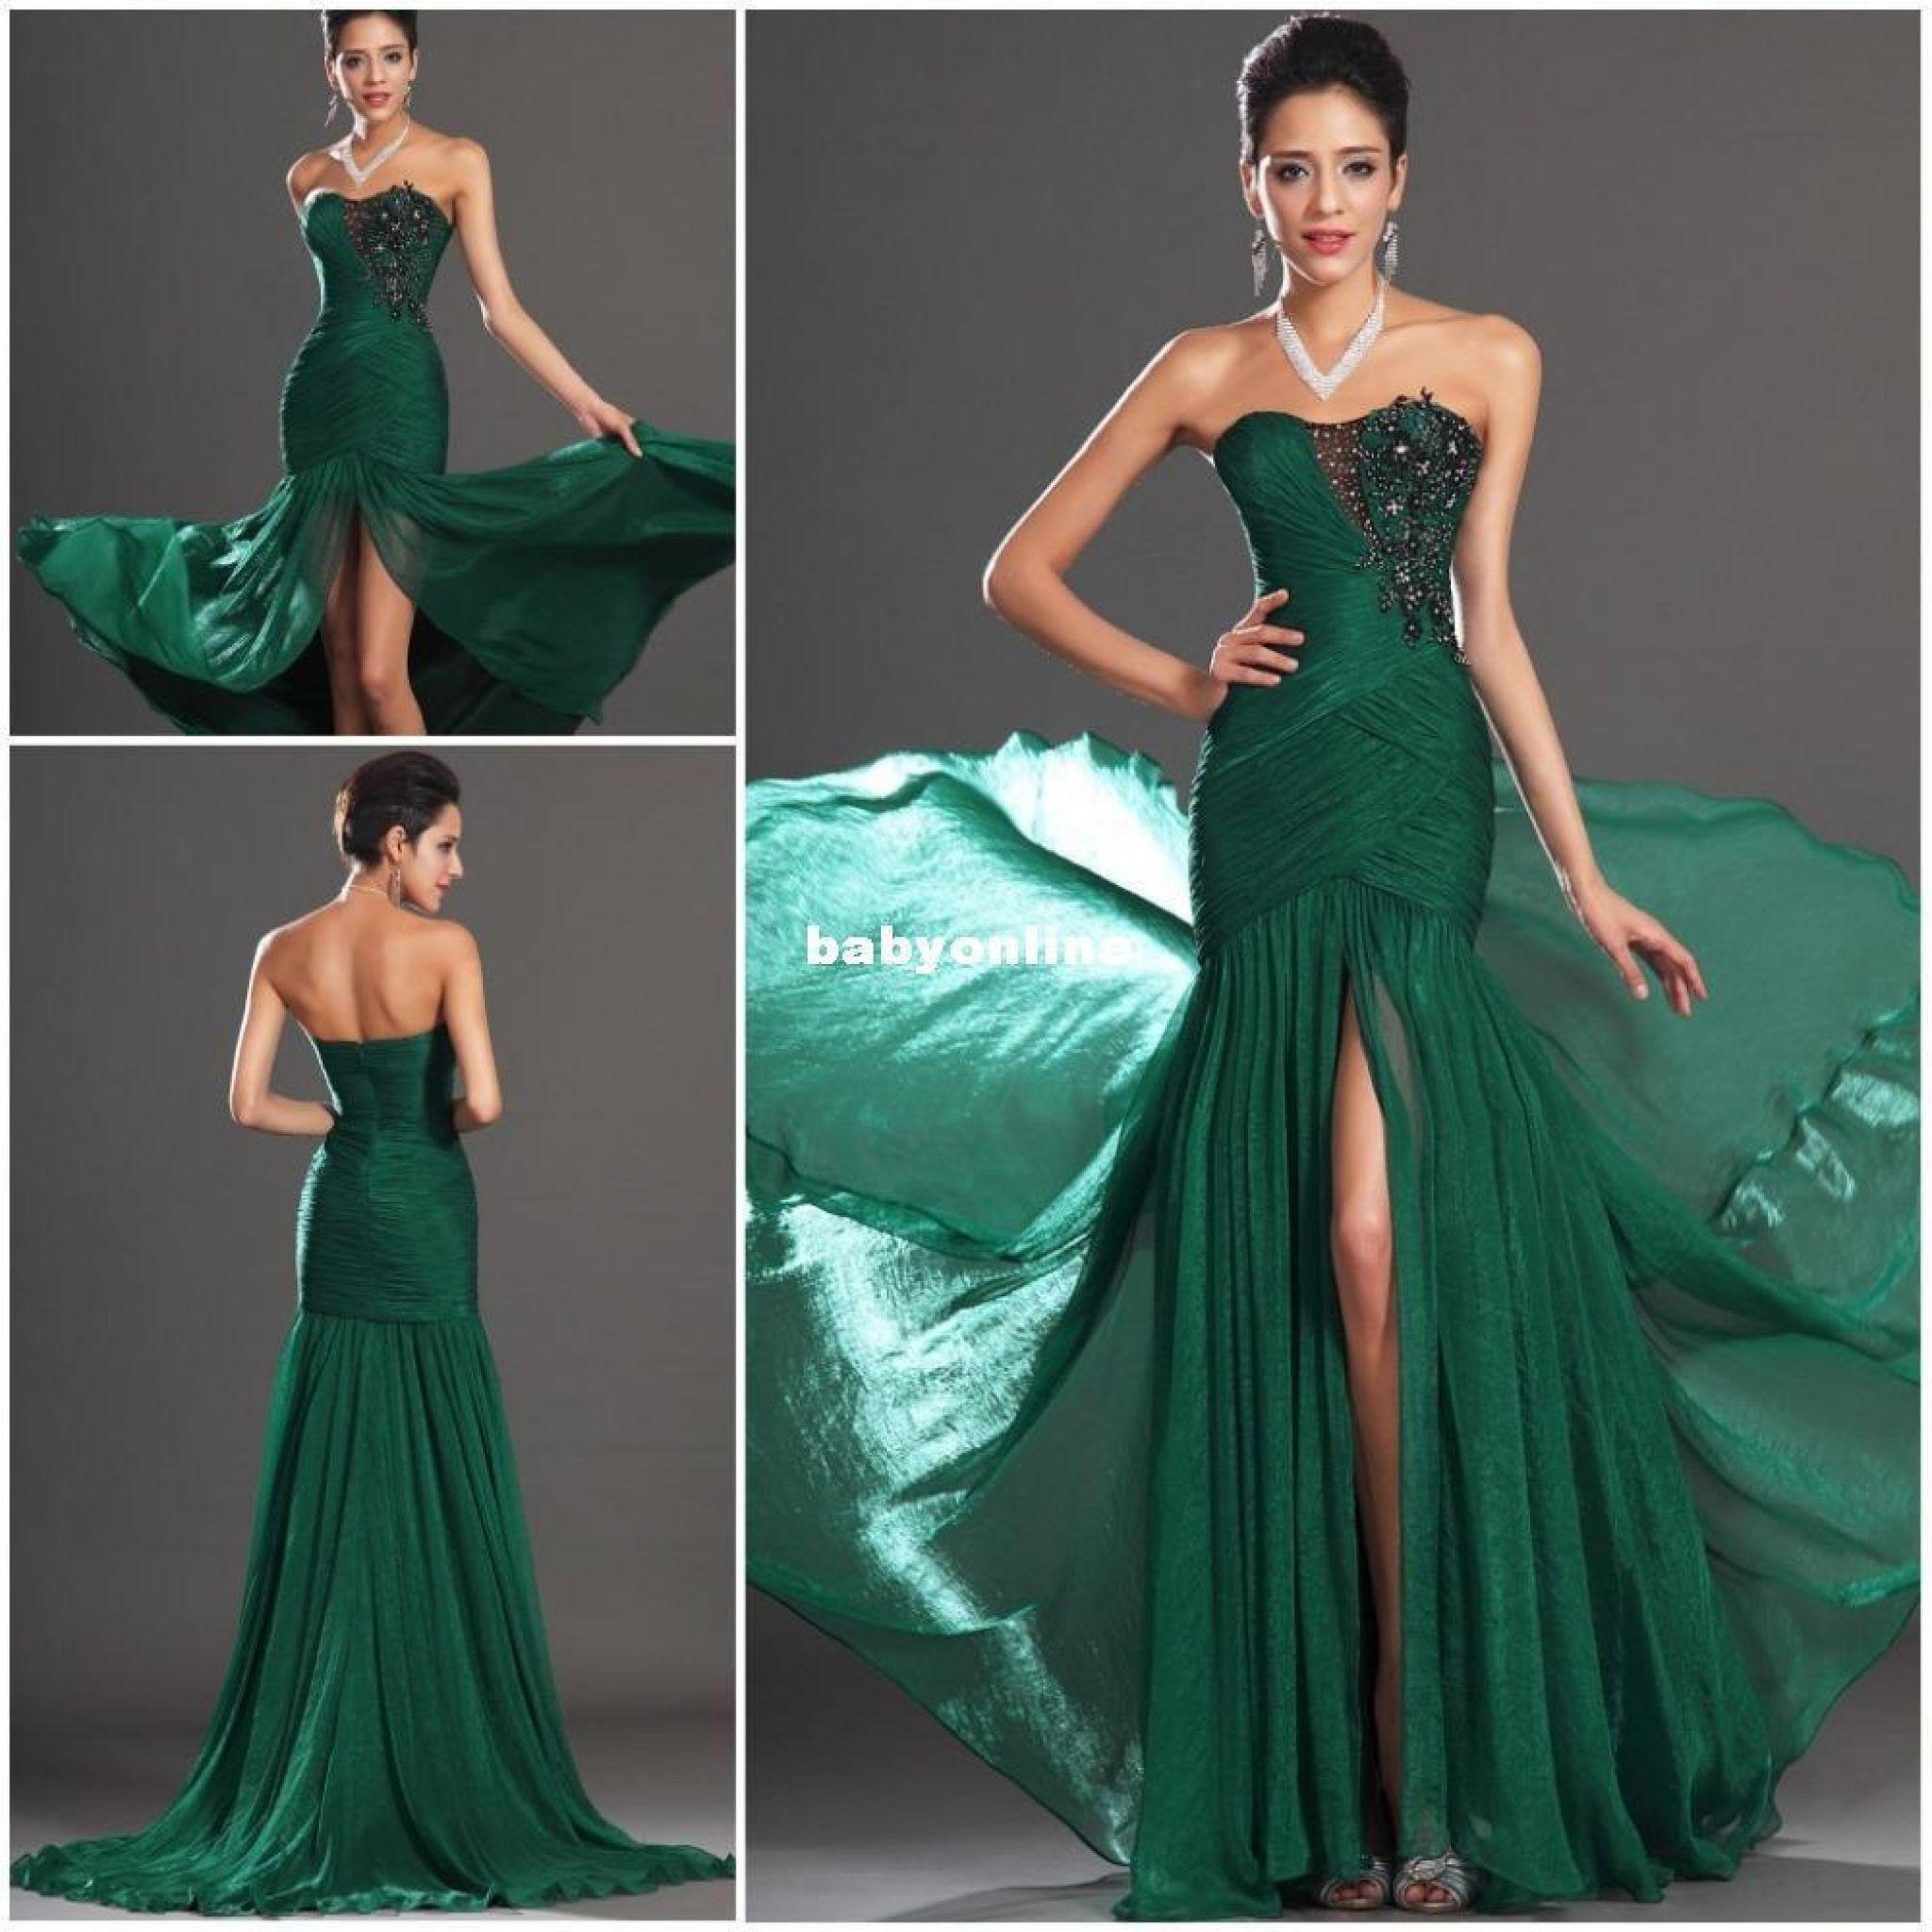 emerald green wedding dresses - best shapewear for wedding dress ...